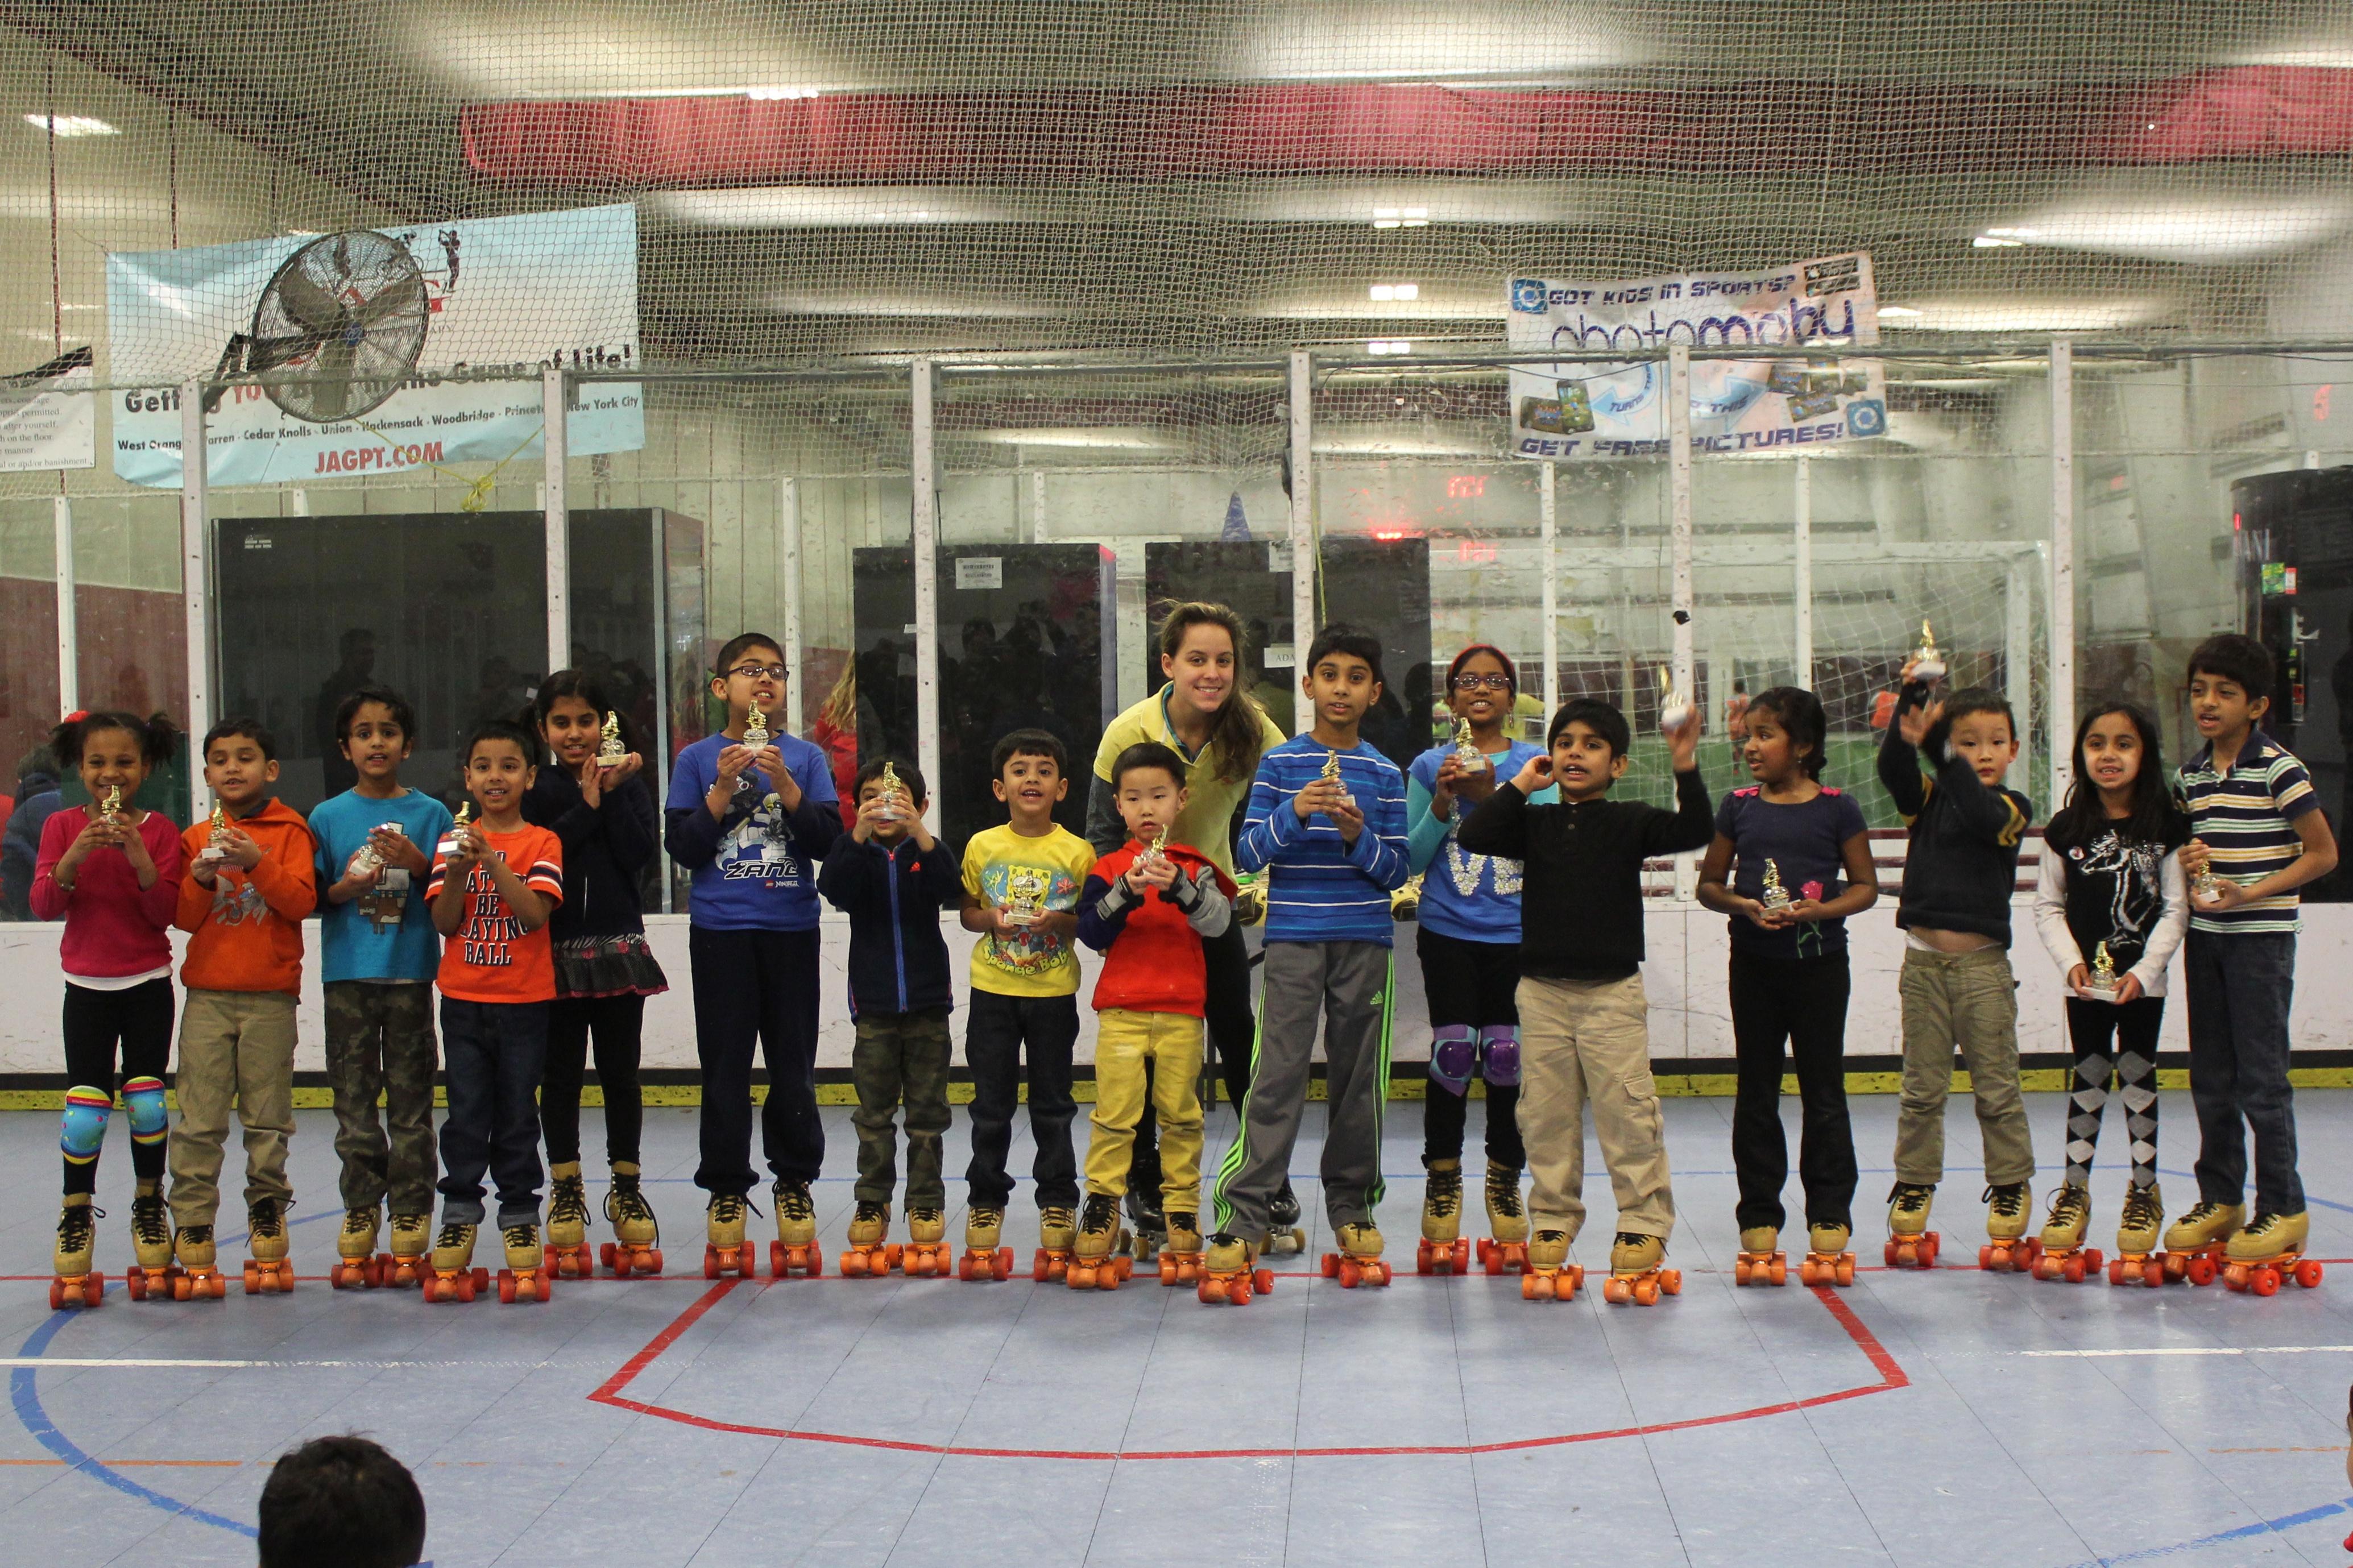 Roller skating rink woodbridge nj - February 2015 Group Class Graduation